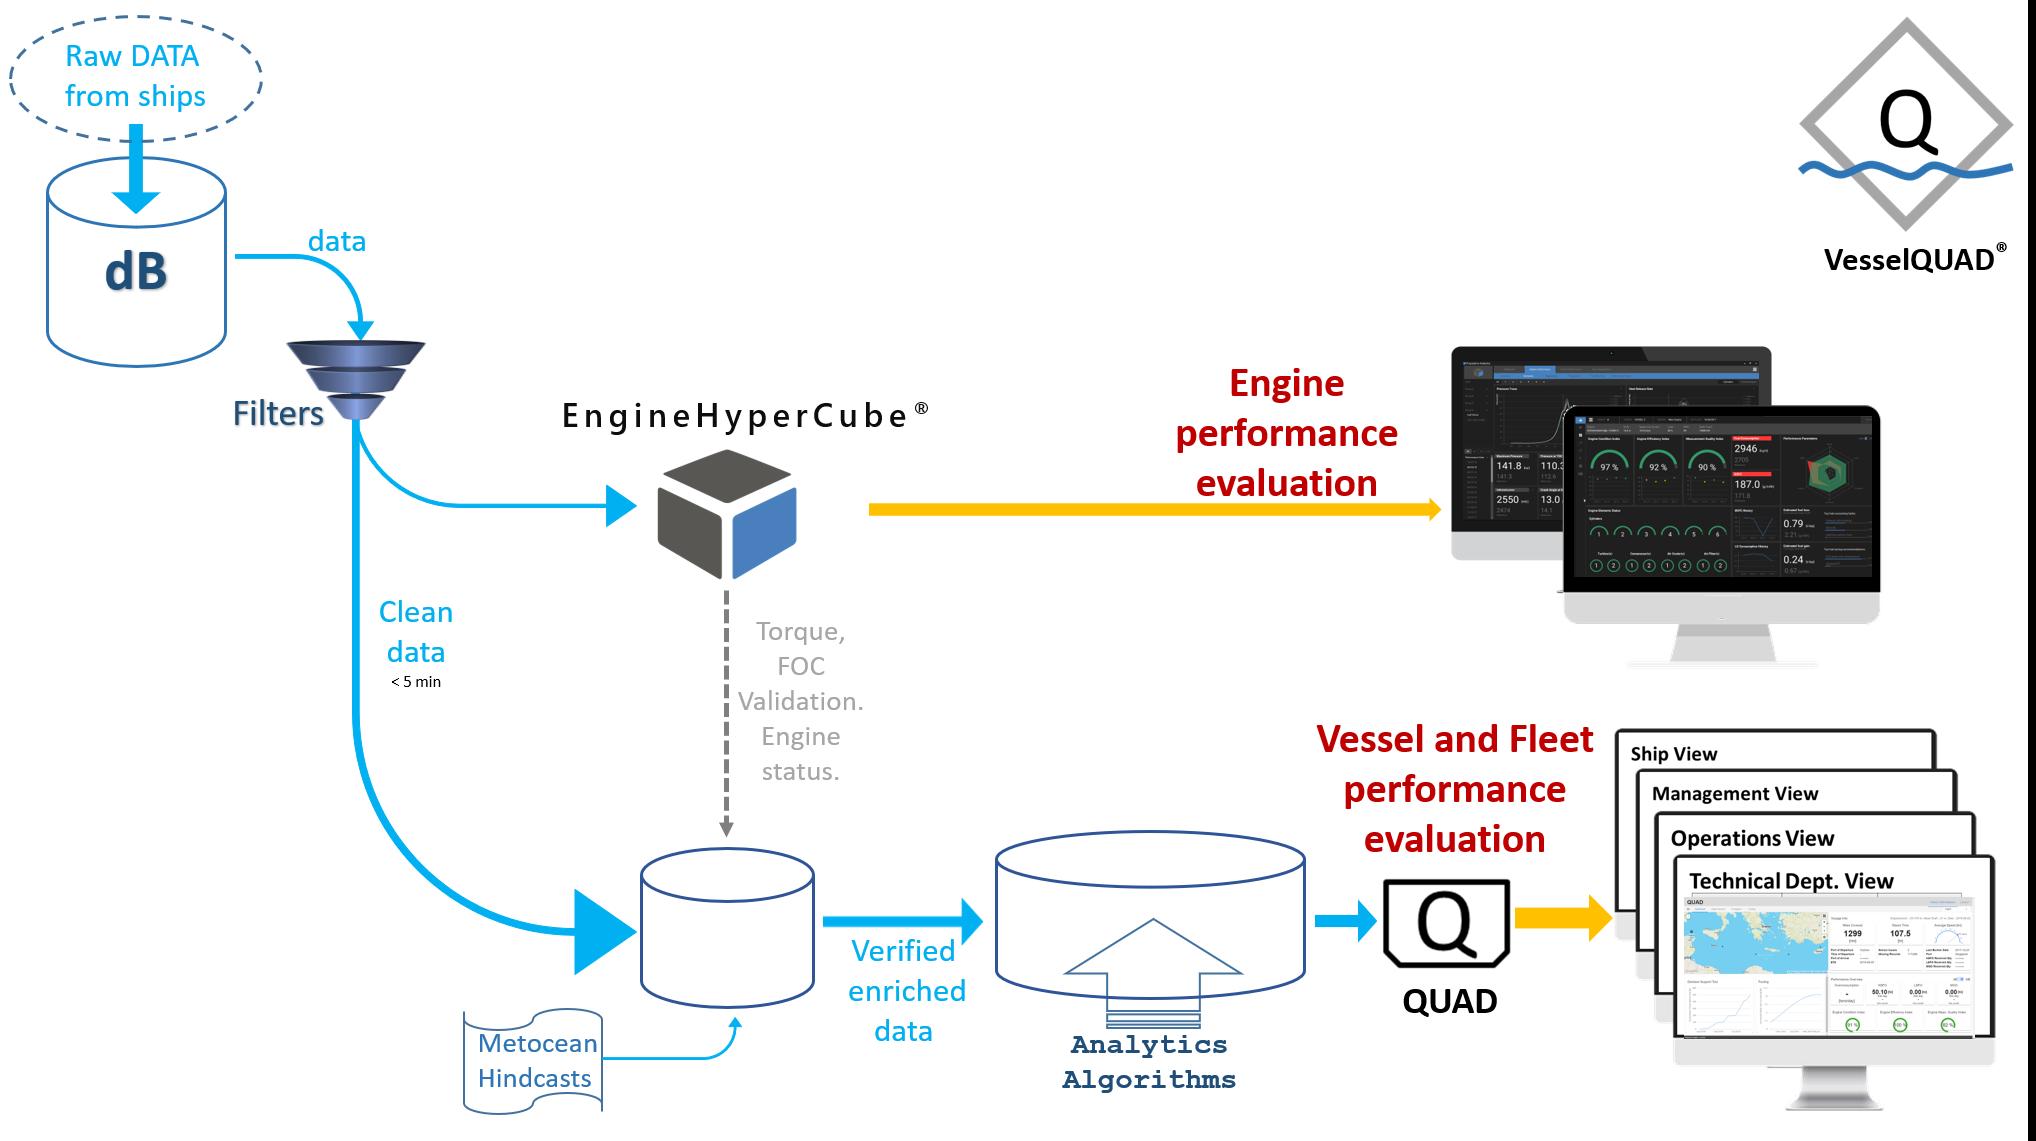 Engine Hyper Cube